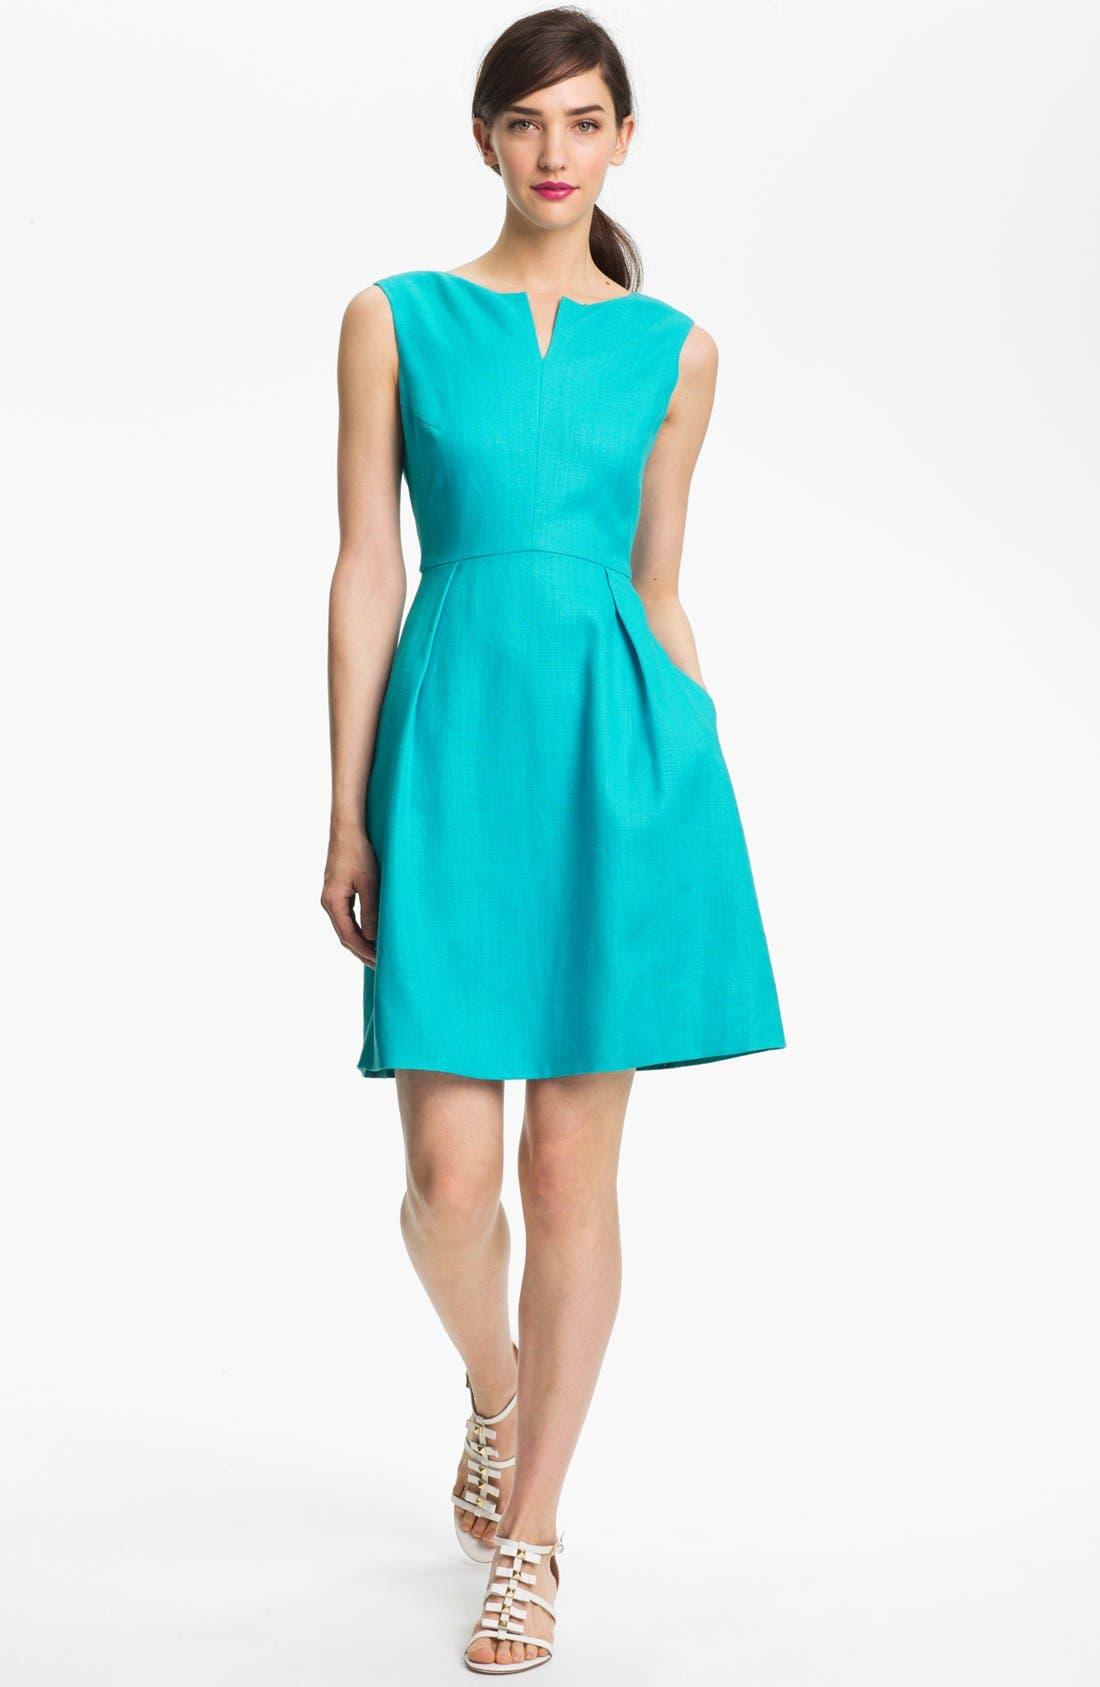 Alternate Image 1 Selected - kate spade new york 'cleo' a-line dress